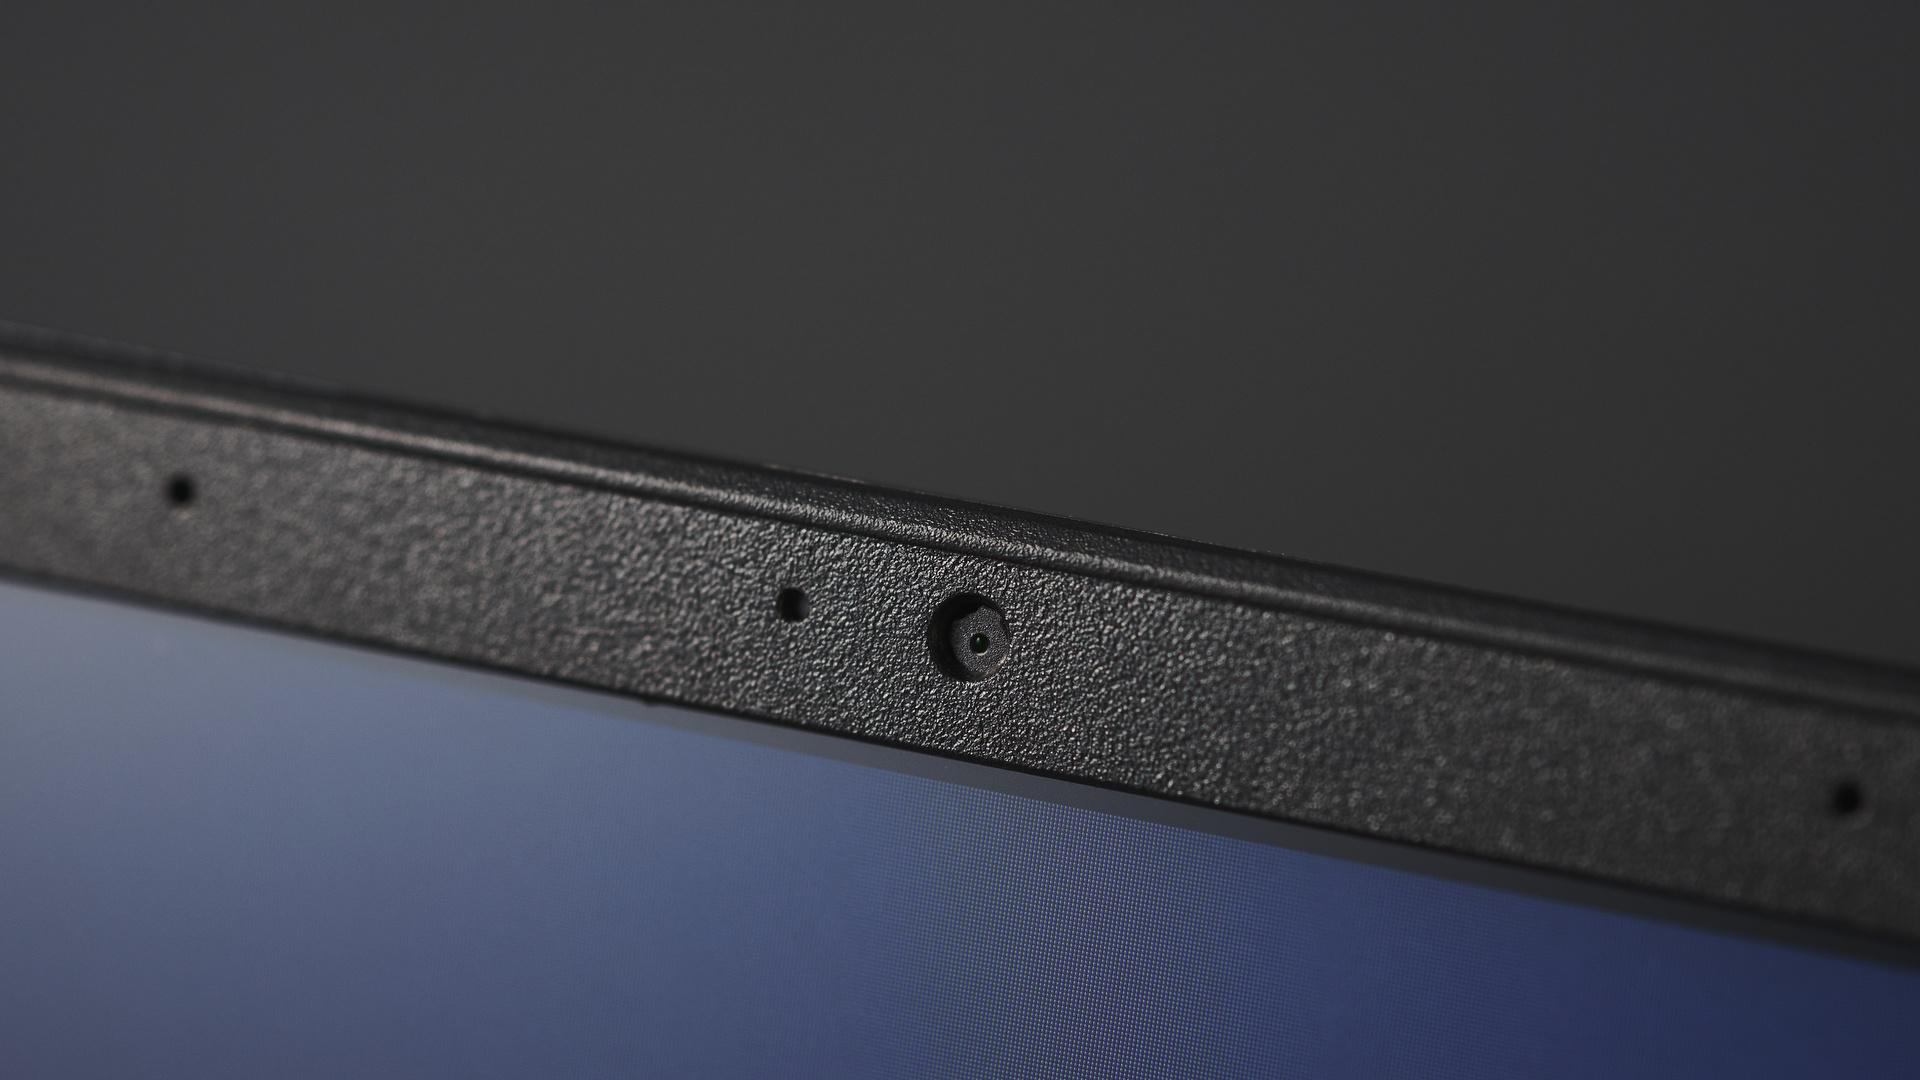 Acer Swift 3X webcam